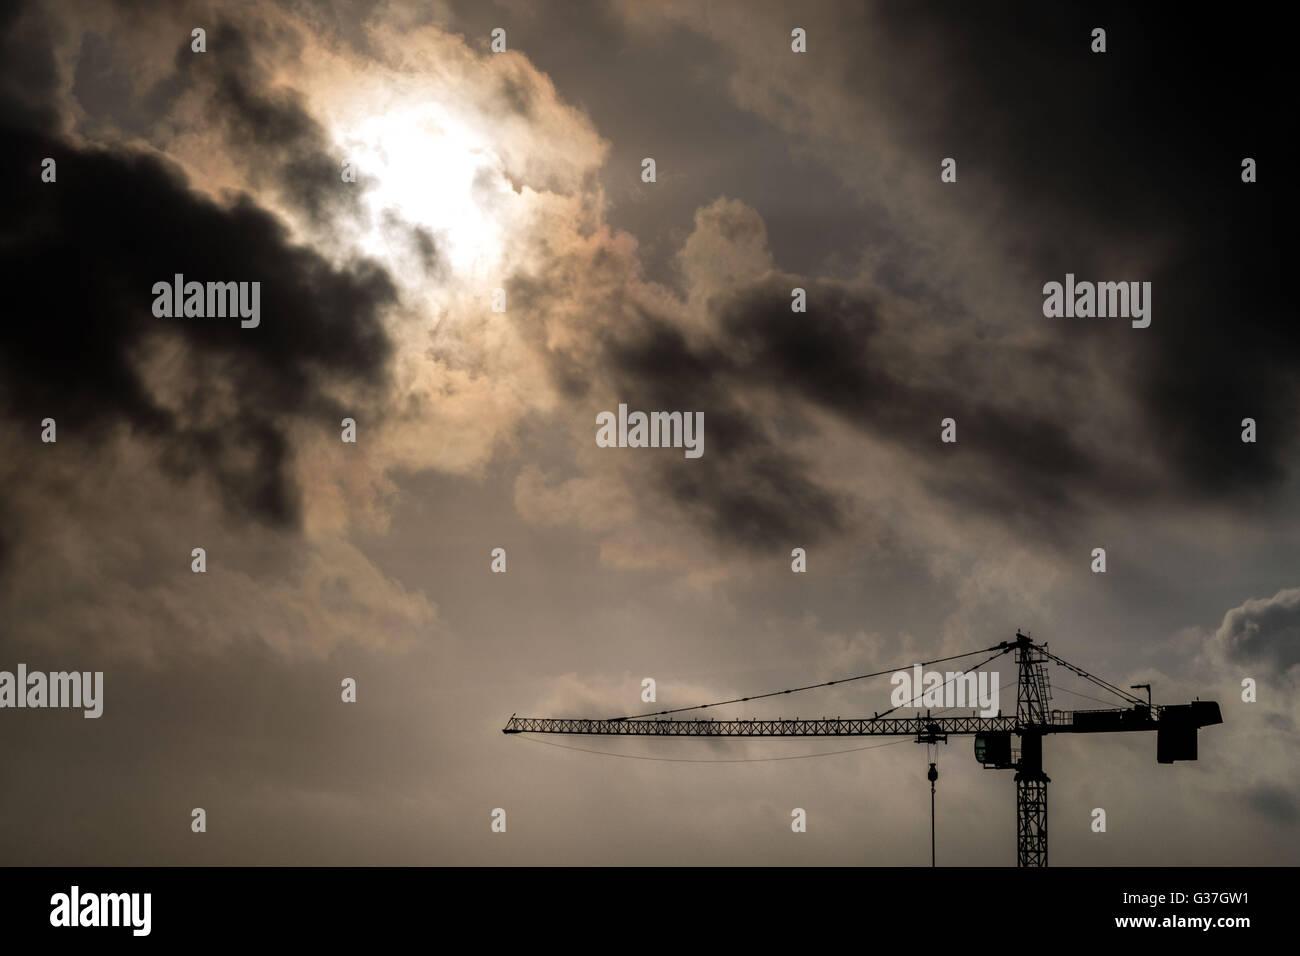 Construction crane seen again the sky in Abidjan, Cote d'Ivoire. - Stock Image